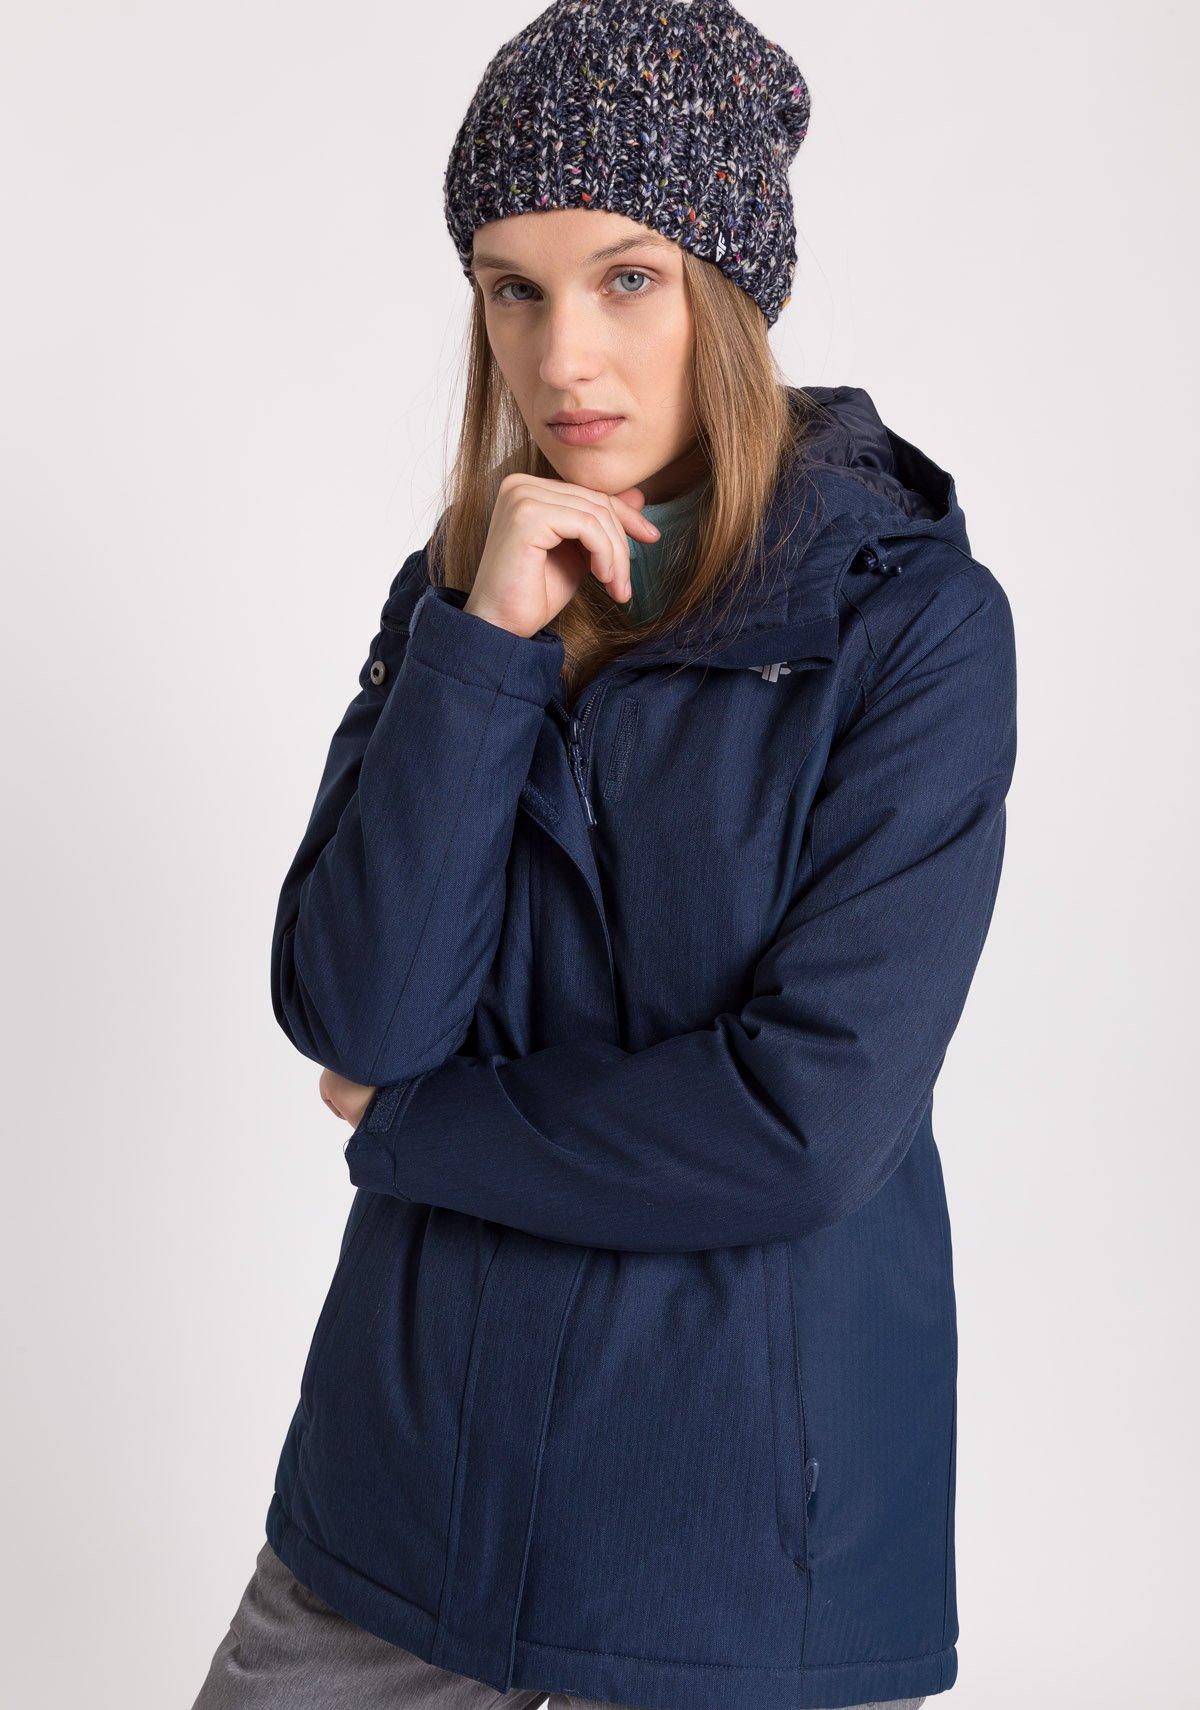 Kurtka narciarska damska KUDN302Z granatowy melanż